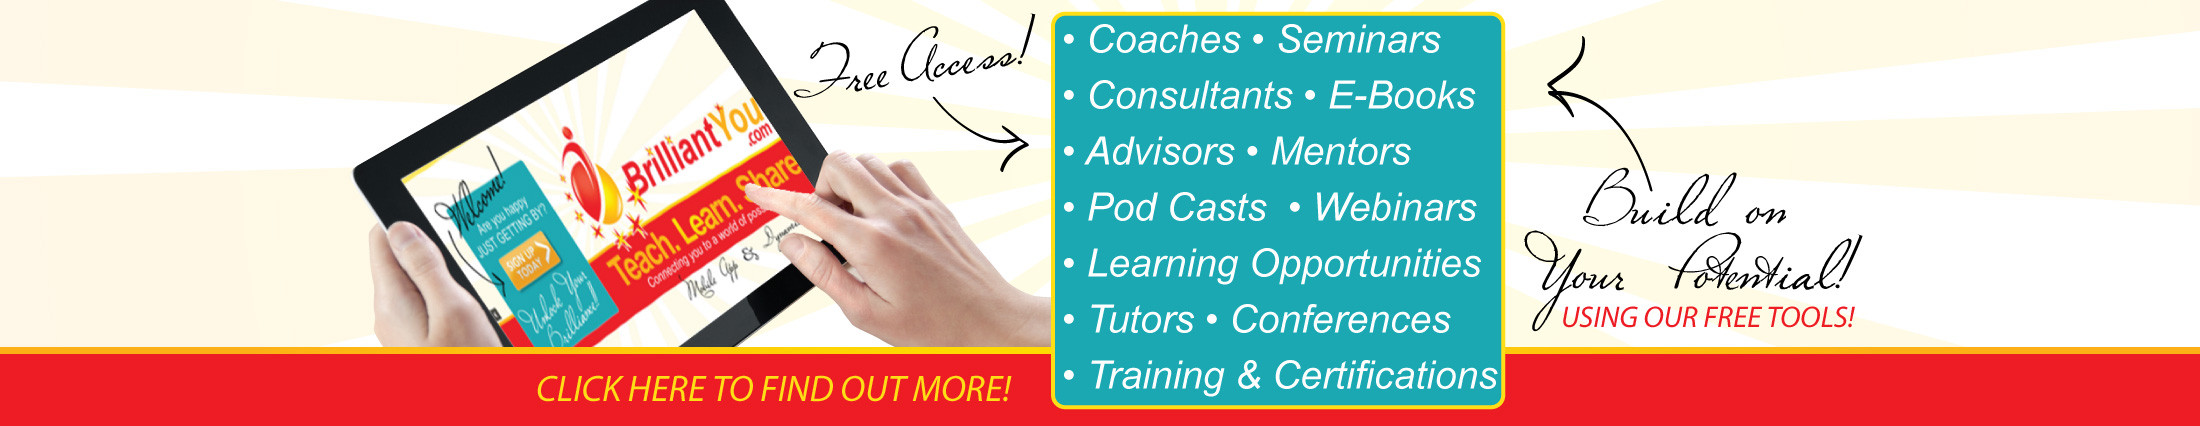 free access to consutants advisors mentors and tutors